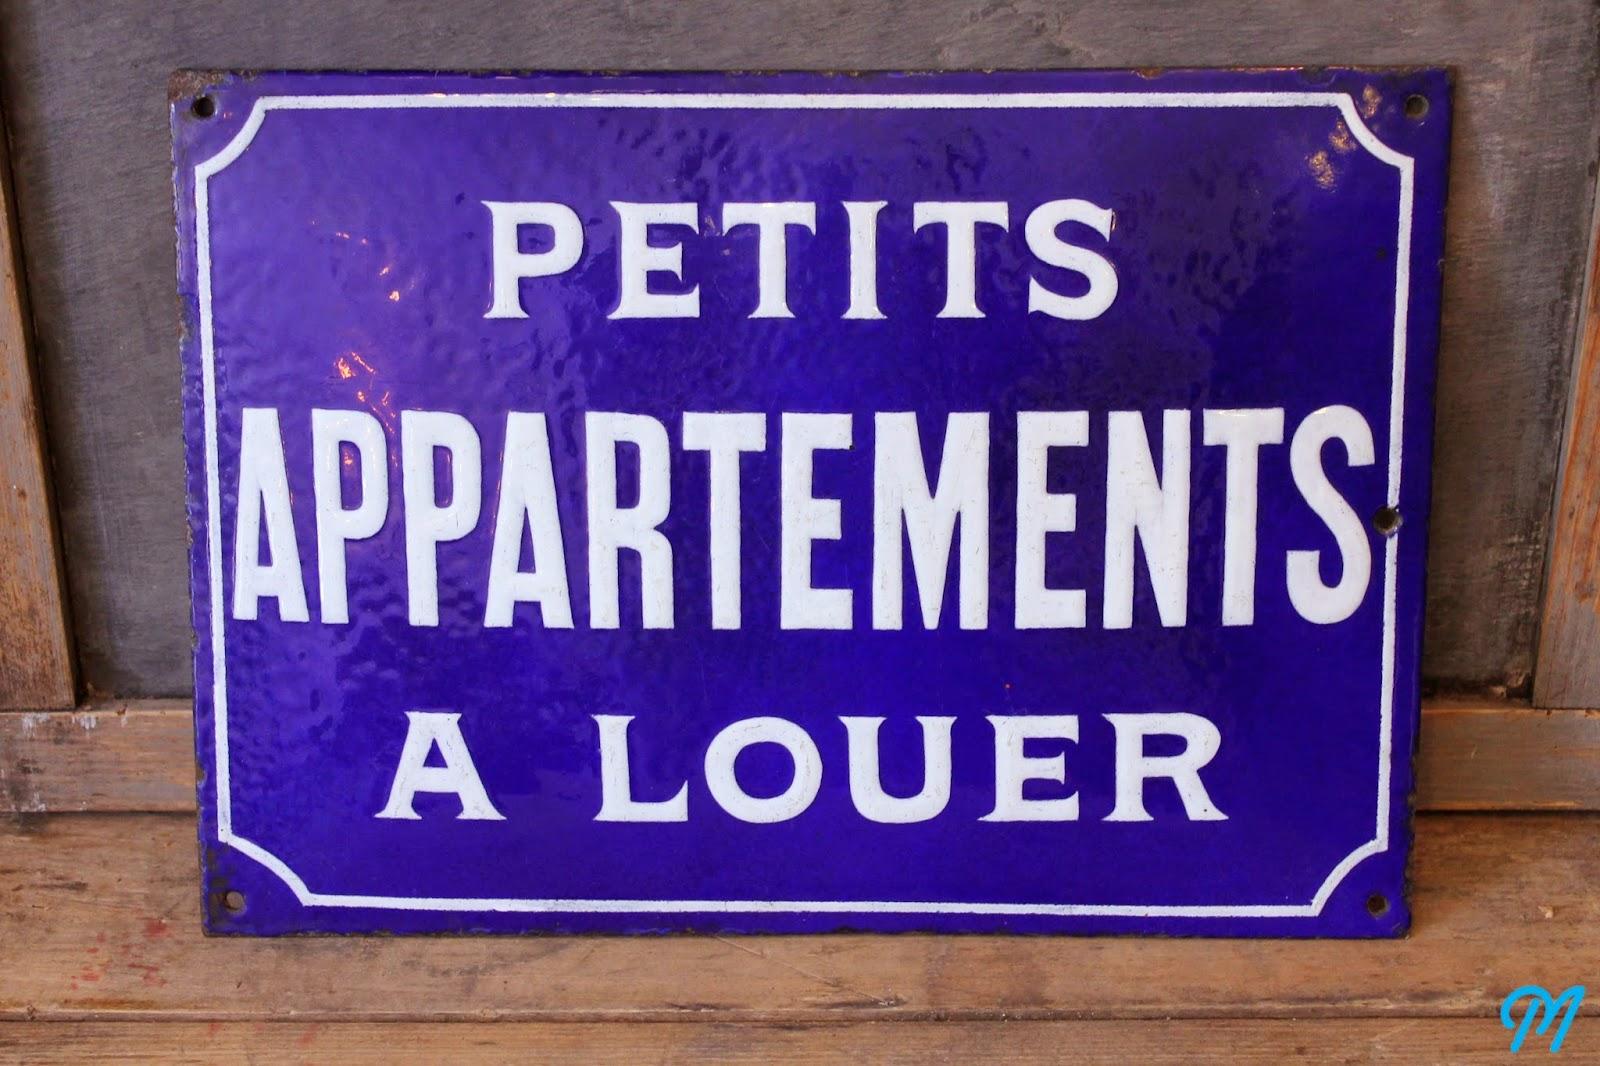 rubans de mercerie plaques maill es cr celles en bois marinette vintage blog. Black Bedroom Furniture Sets. Home Design Ideas